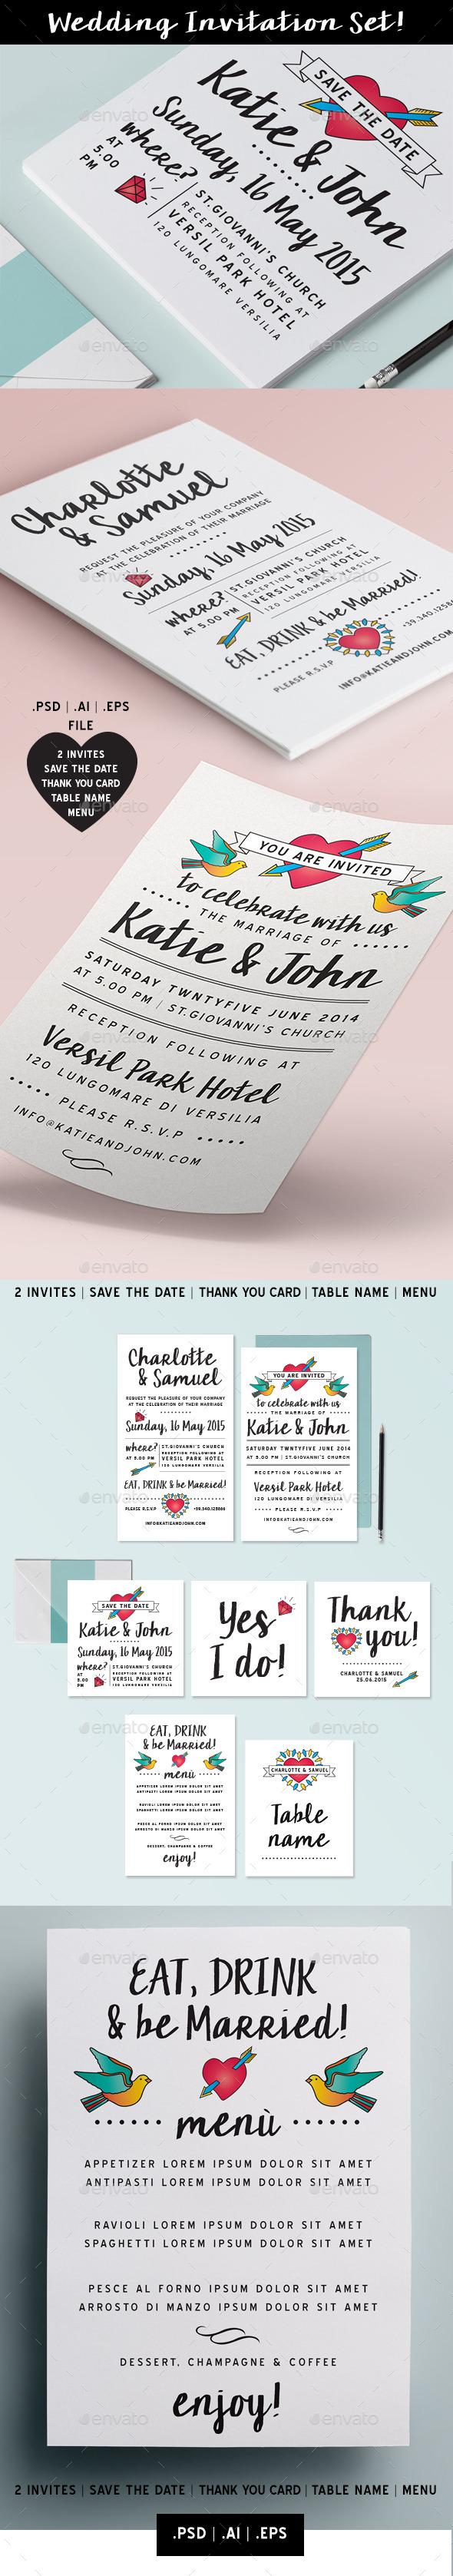 GraphicRiver Wedding invitation Set vol 6 11356353